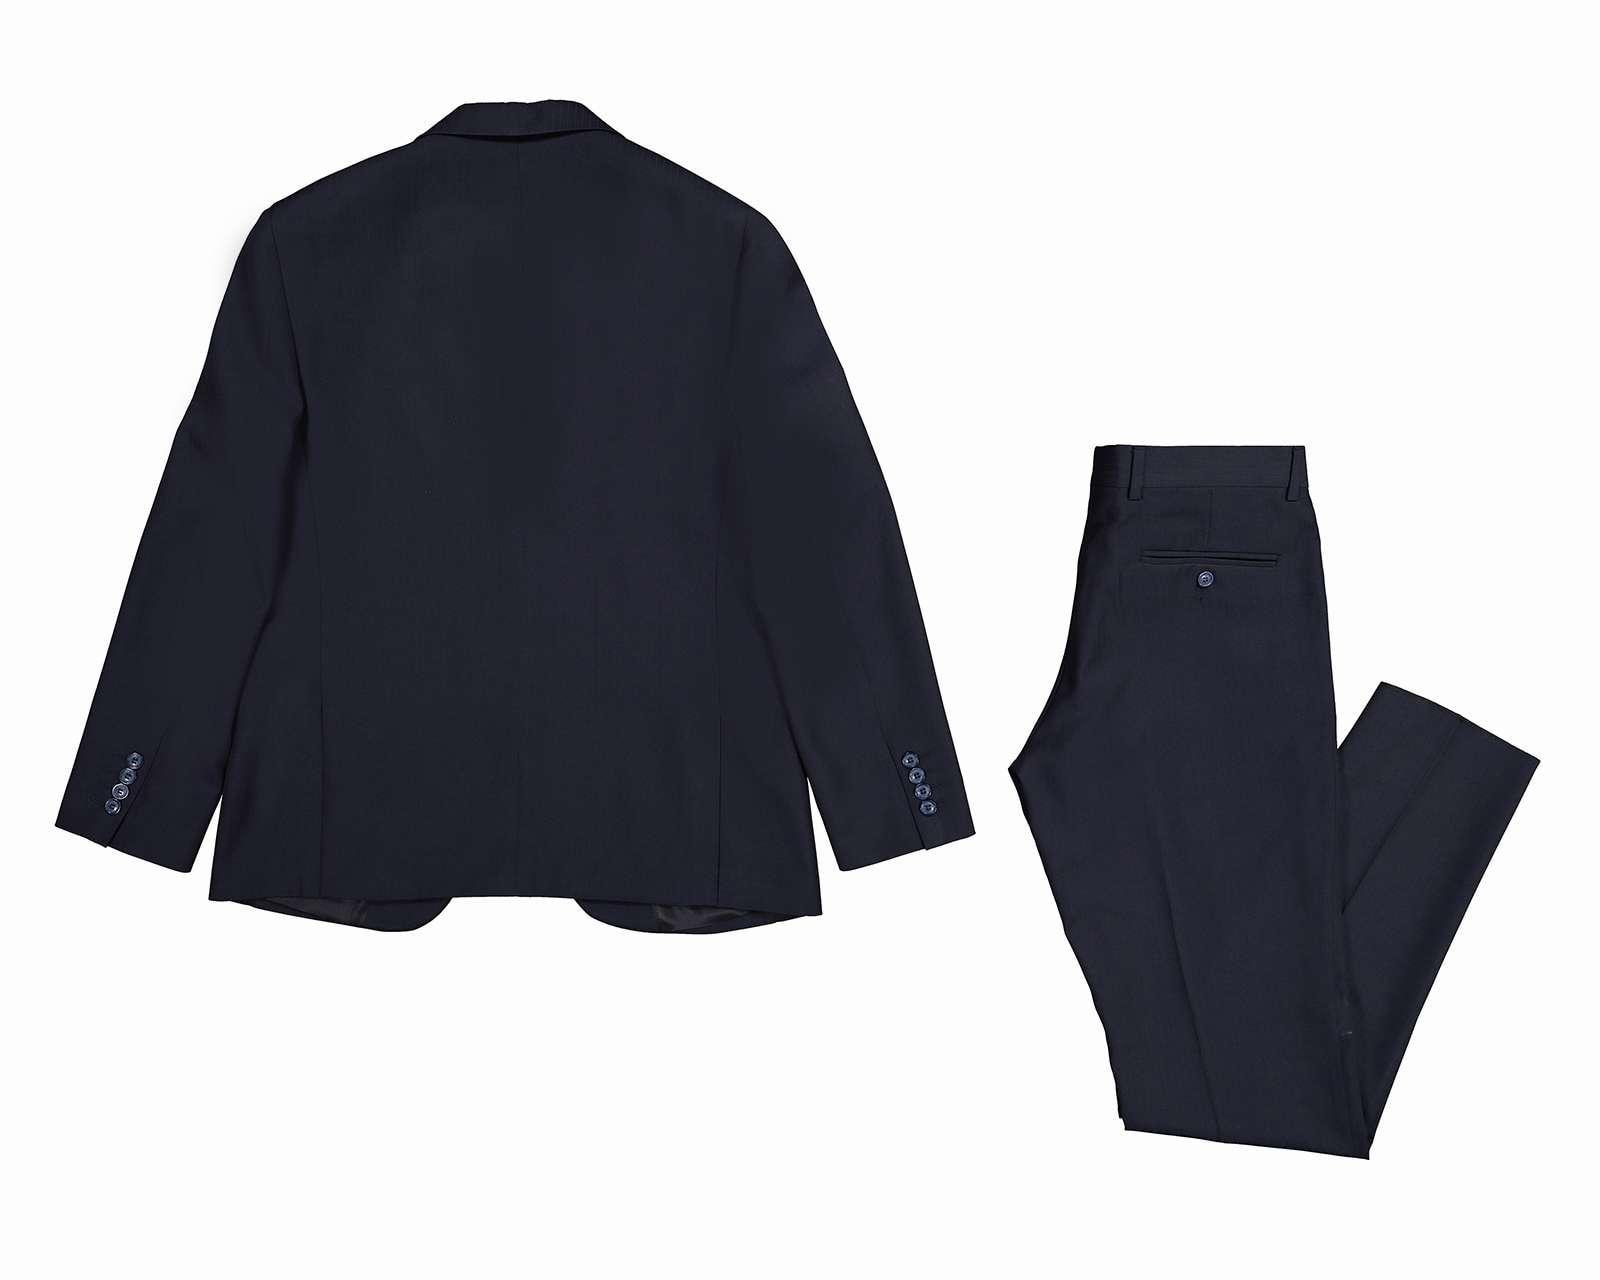 Foto 2|Traje de Vestir Azul marca Wall Street para Hombre